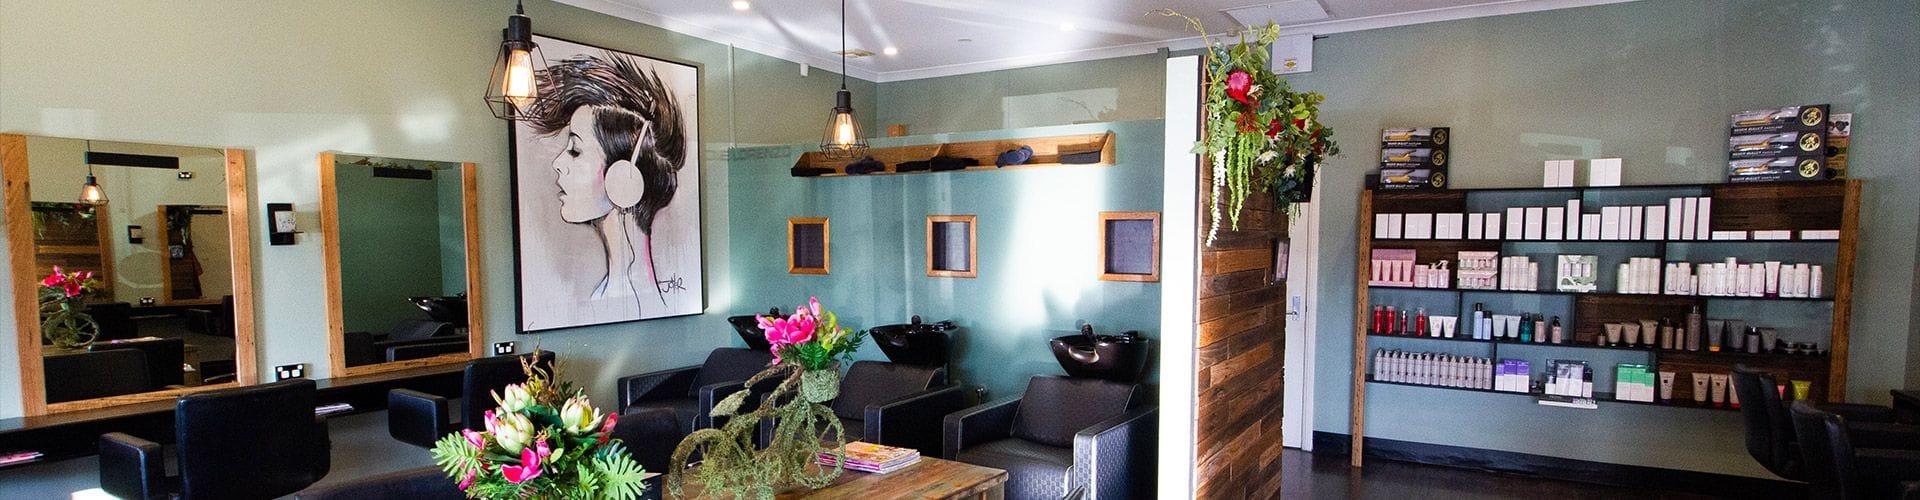 Contact Park Hair - Jerrabomberra Hairdressers